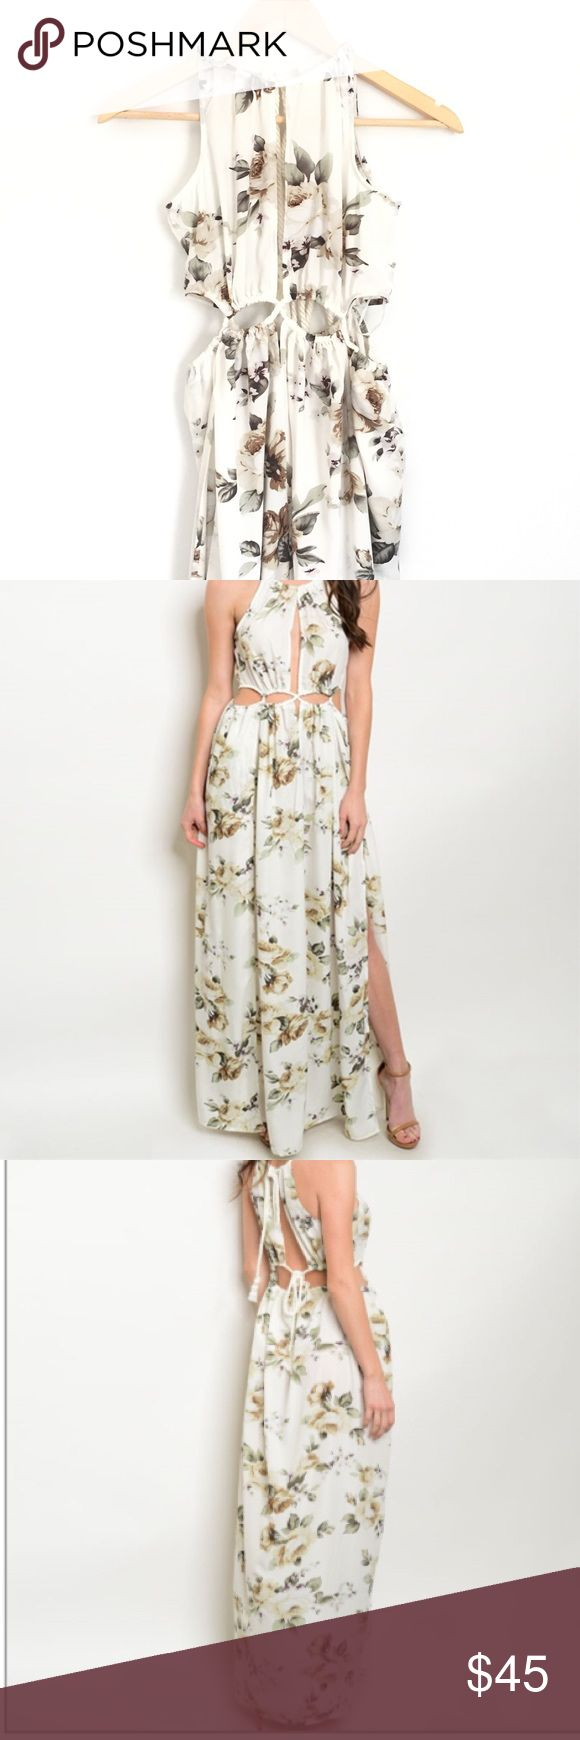 Dress for summer wedding guest 2018 dodge